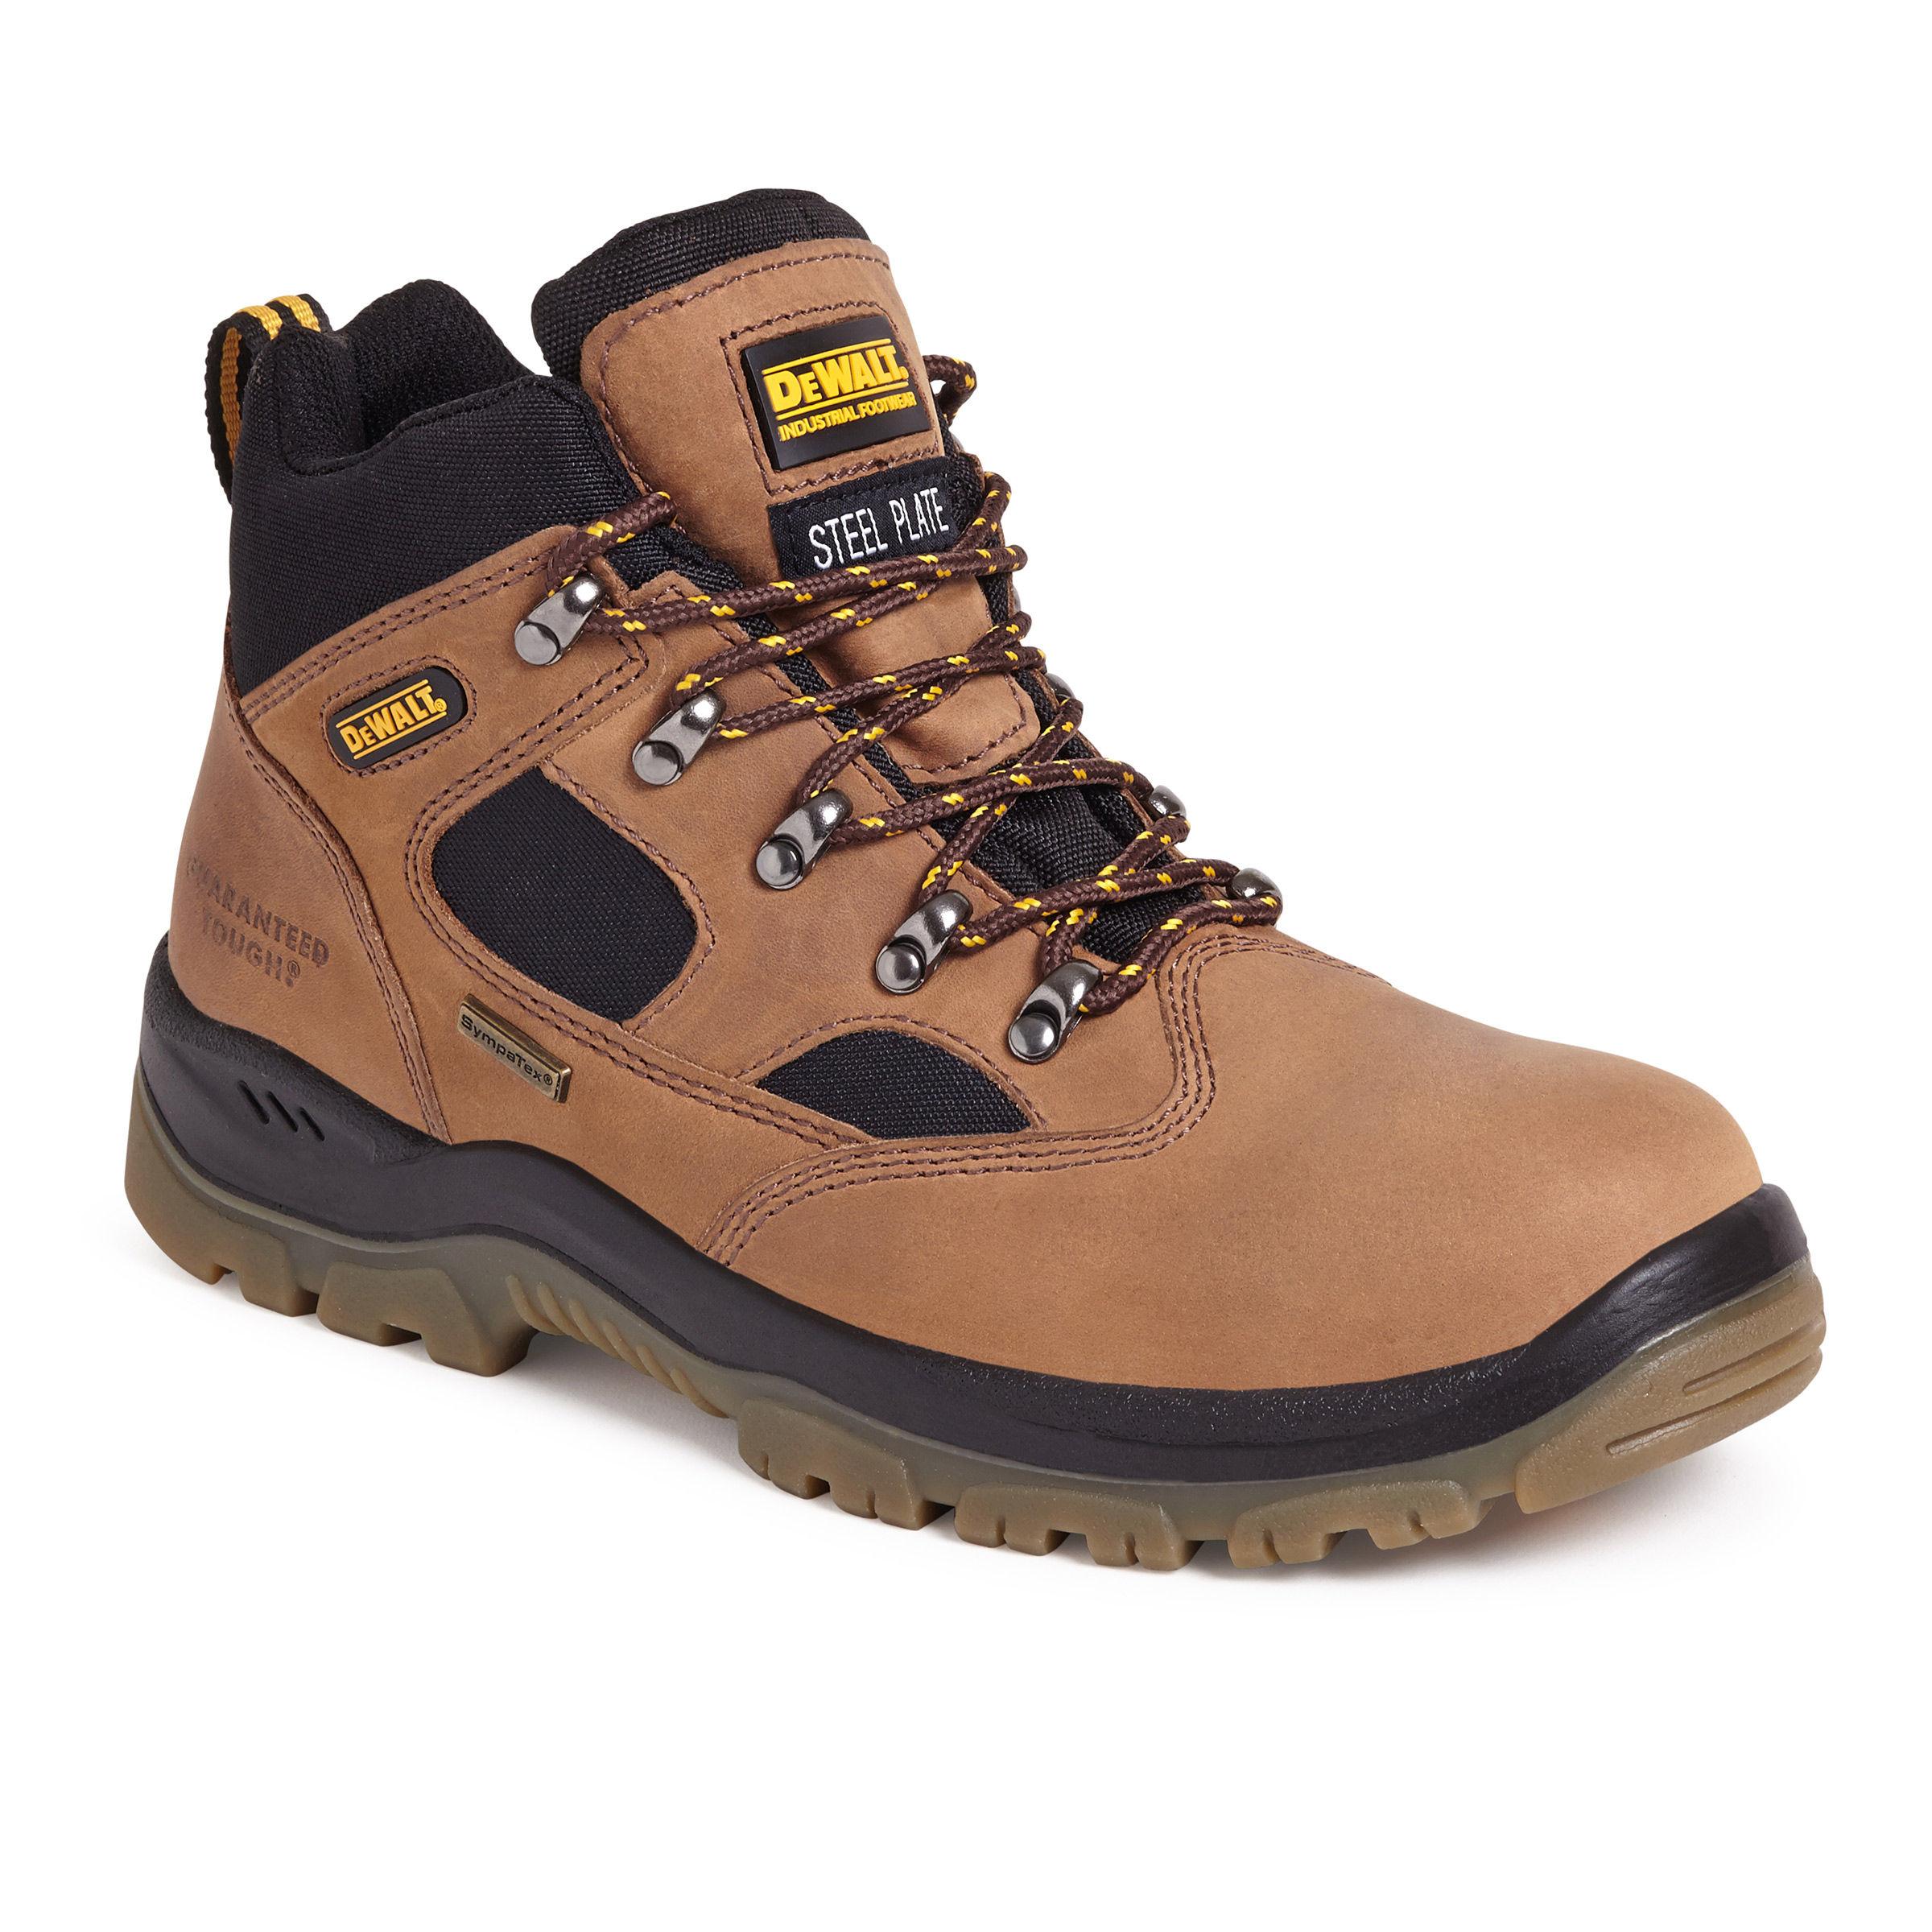 17bd8ced42d Dewalt Challenger 3 Waterproof Sympatex Safety Hiker Boot in Brown - Size 6